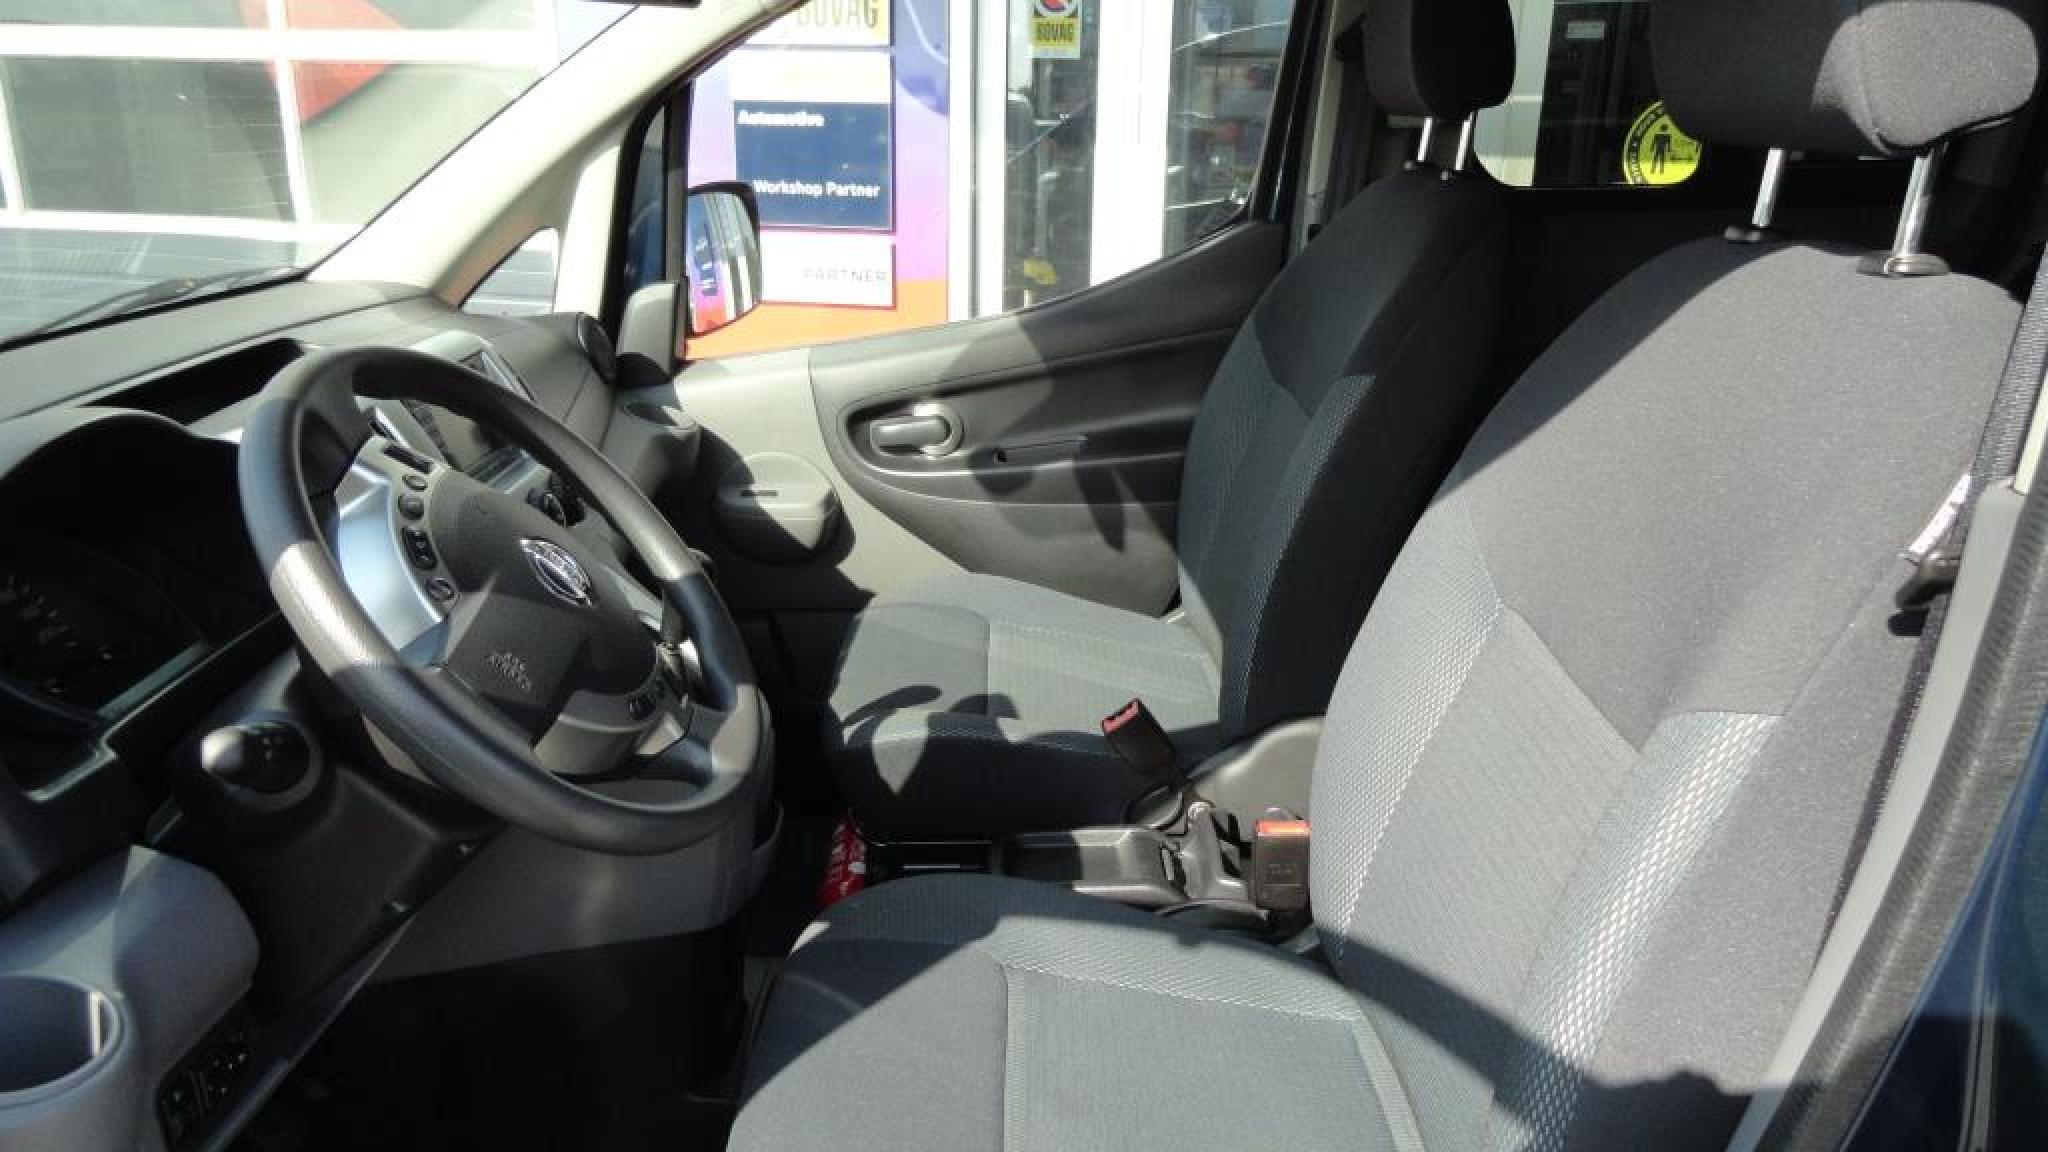 Nissan-NV 200 Evalia-10